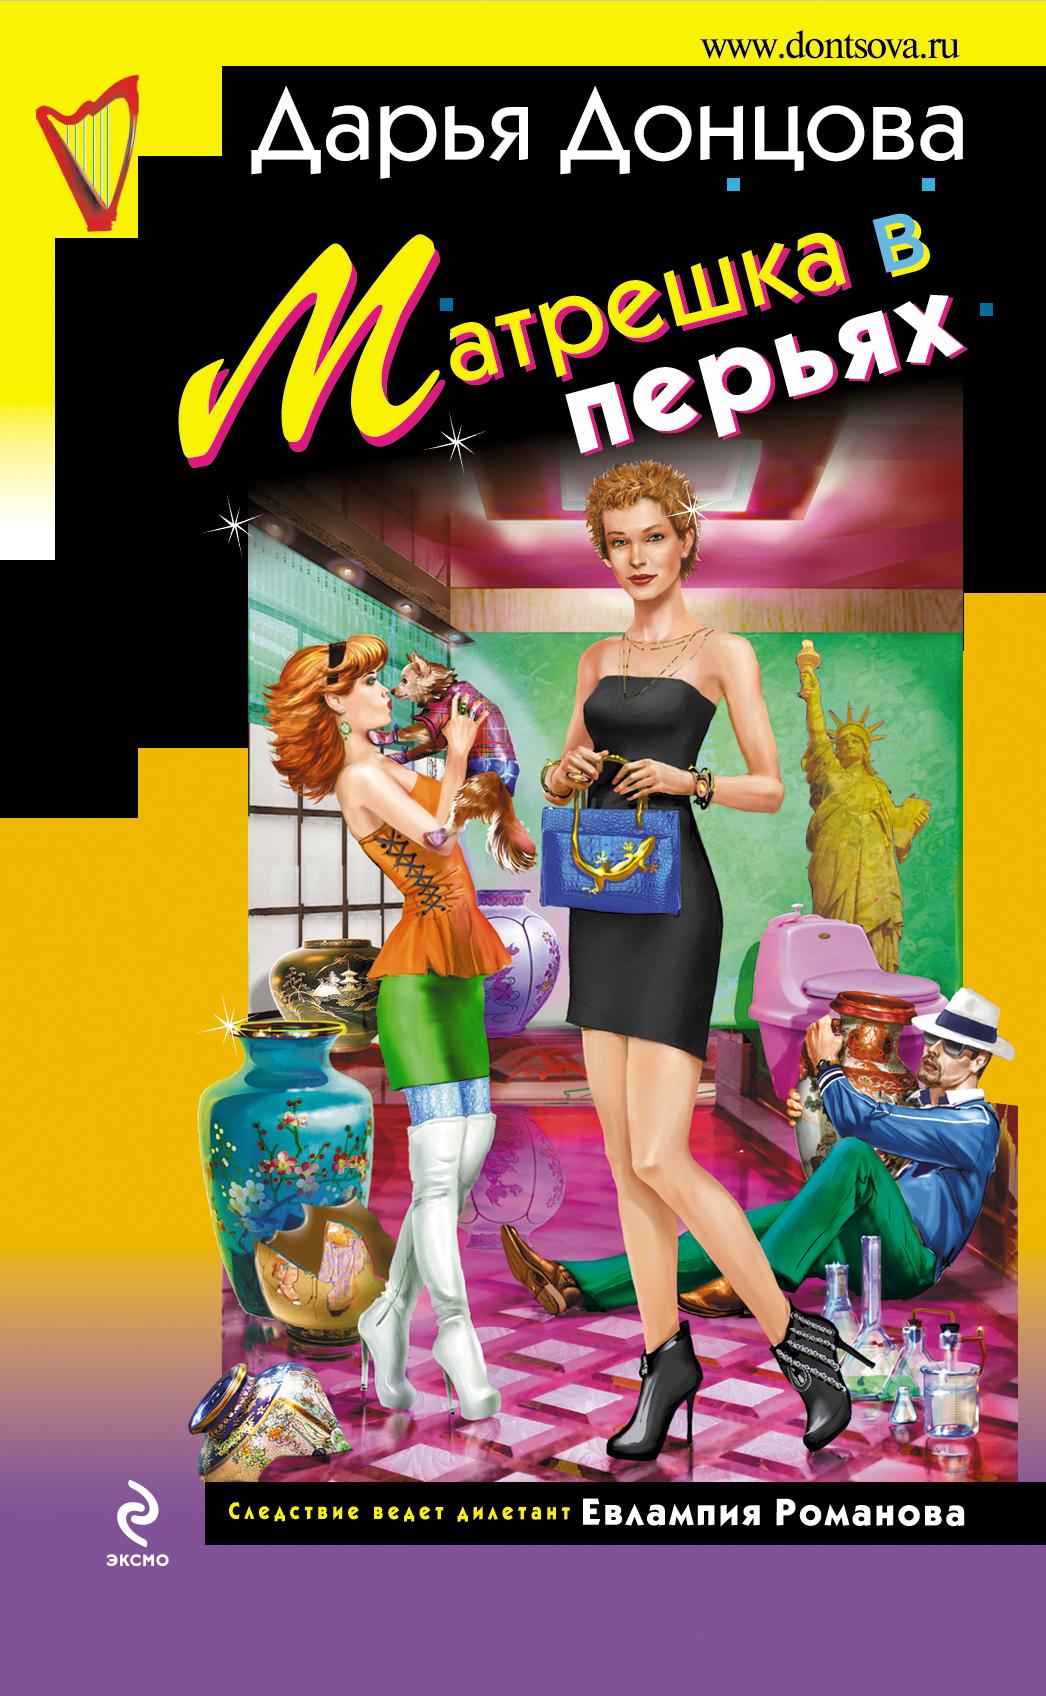 Донцова Д.А. Матрешка в перьях мне предлагают 1комнат квартиру